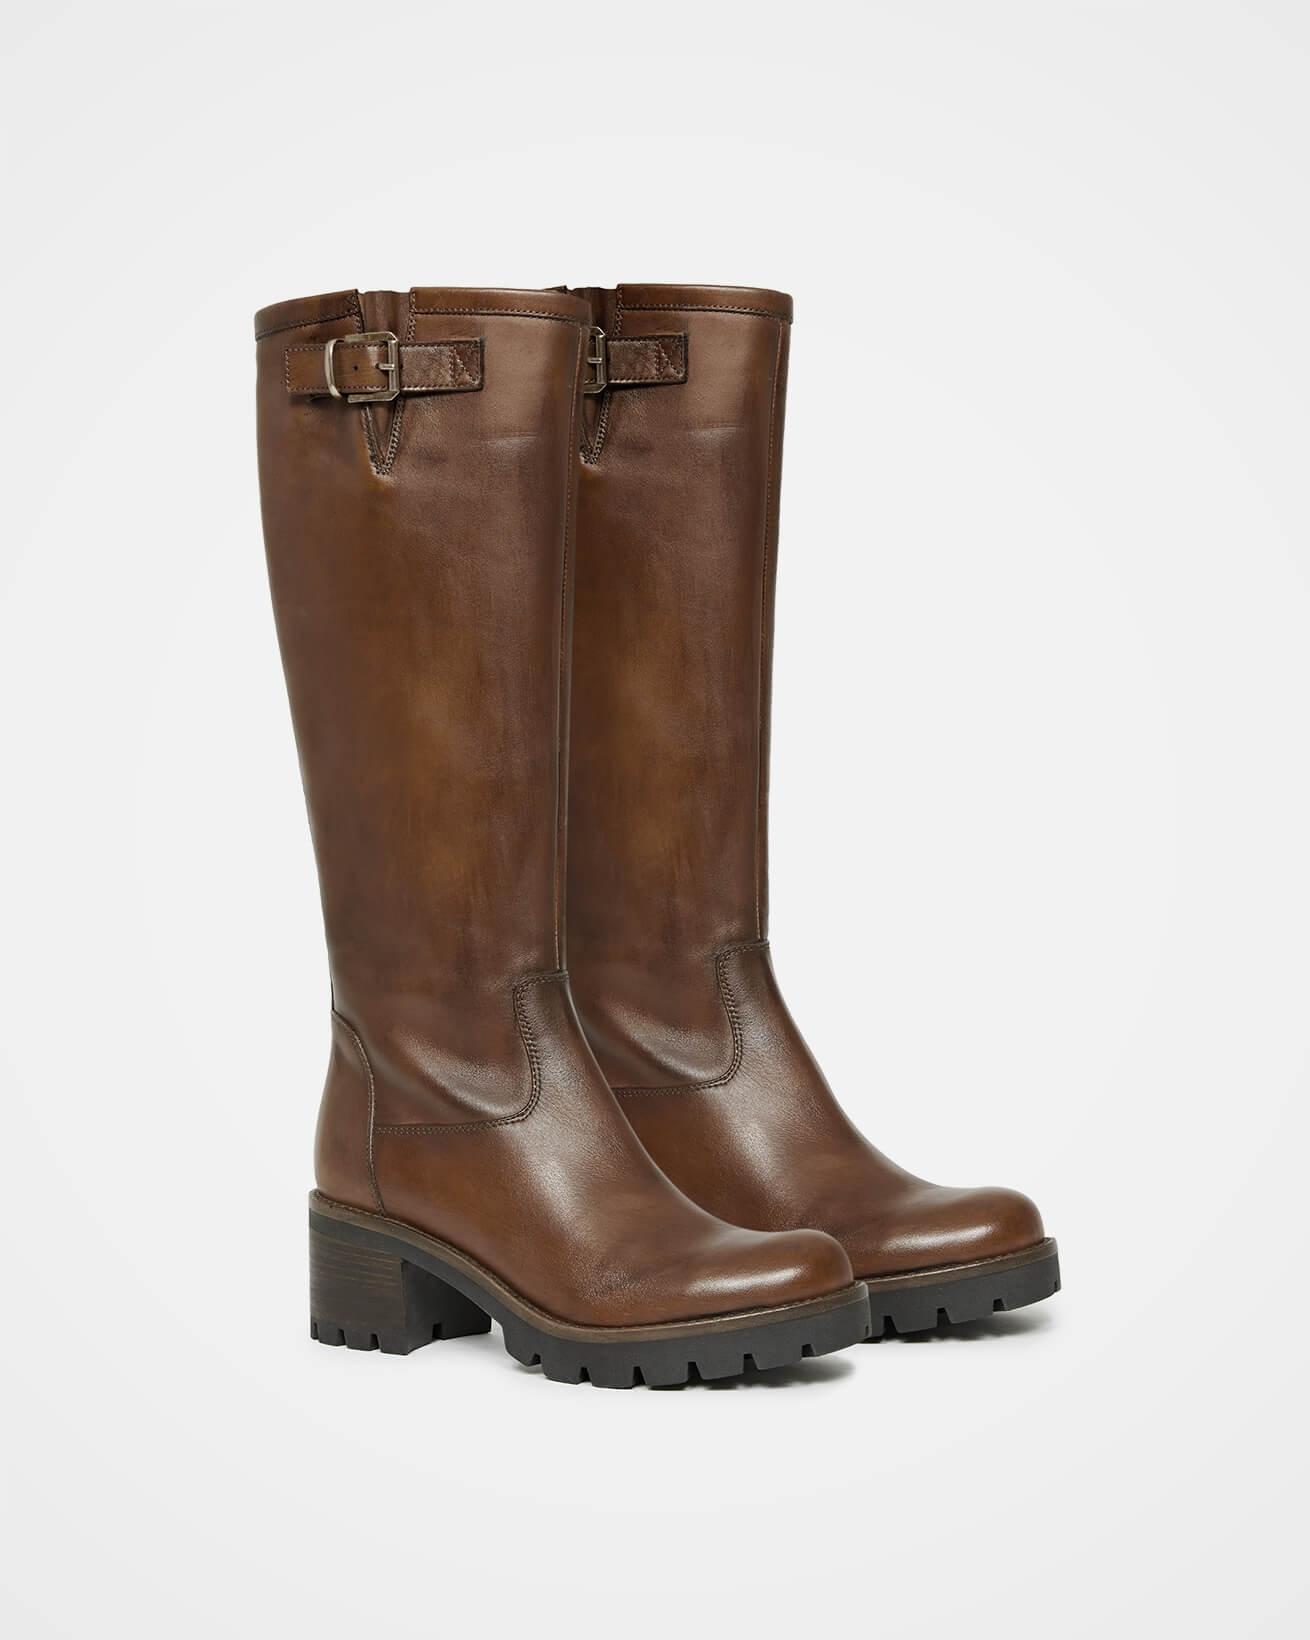 7640_biker-knee-boot_antique-brown_pair_cutout_web.jpg